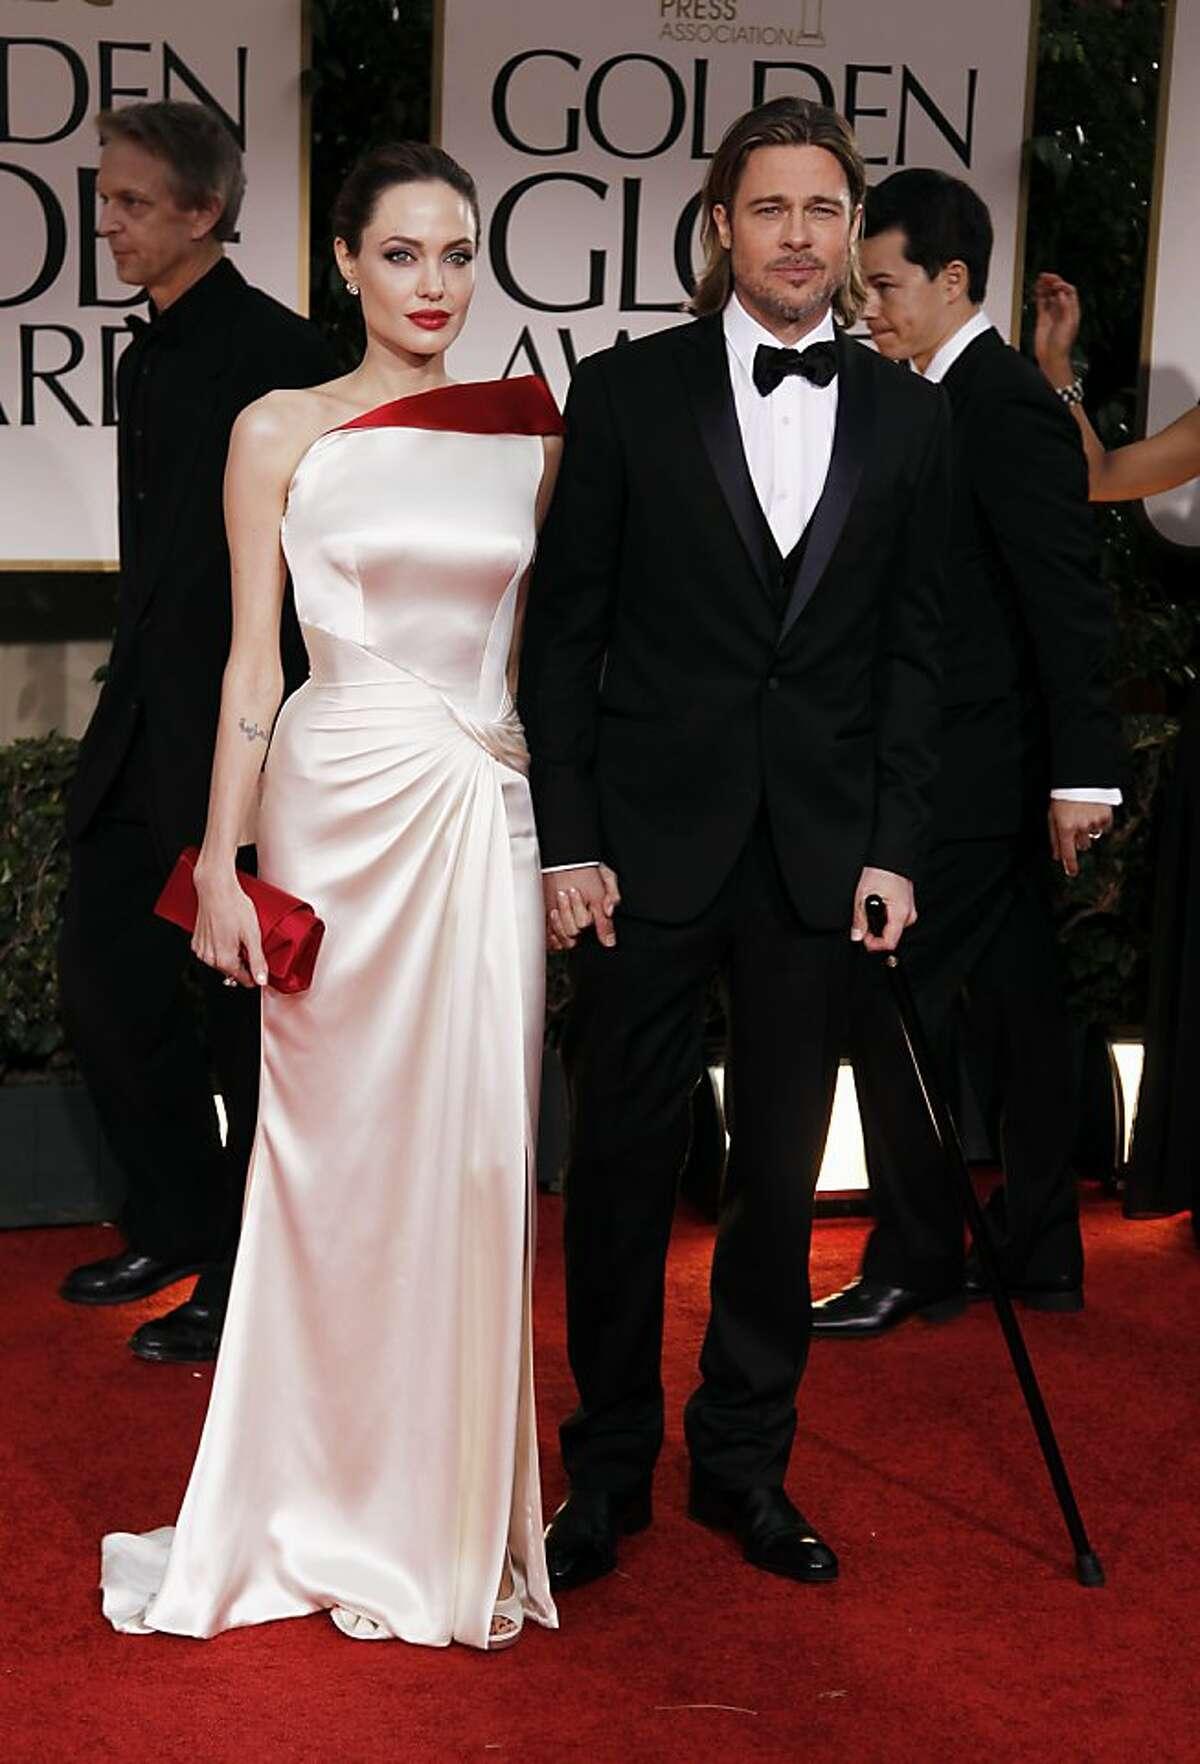 Angelina Jolie, left, and Brad Pitt arrive at the 69th Annual Golden Globe Awards Sunday, Jan. 15, 2012, in Los Angeles. (AP Photo/Matt Sayles)